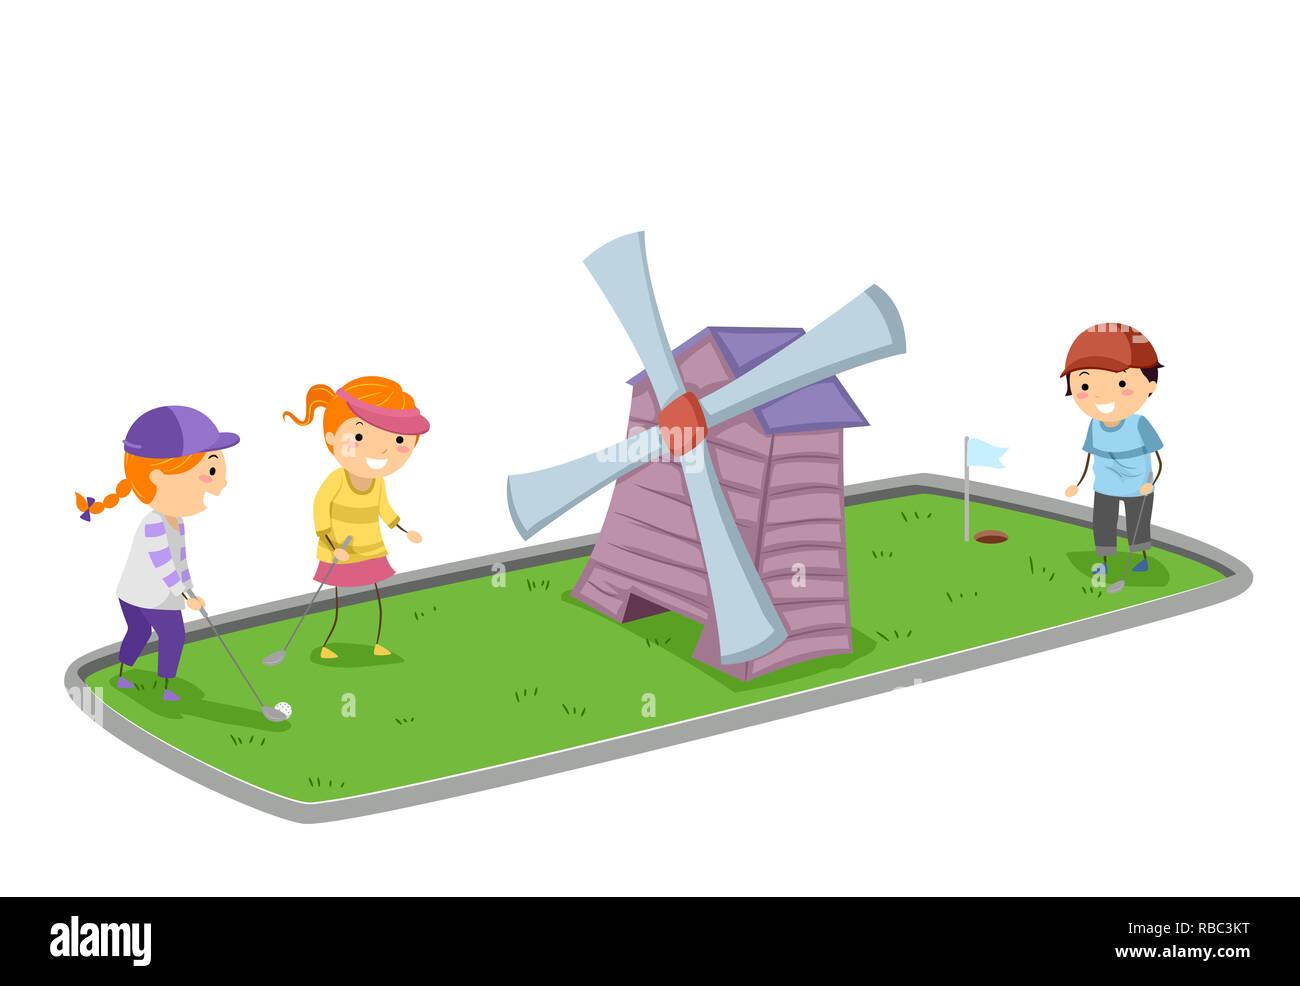 Illustration Of Stickman Kids Playing Mini Golf With A Wind Mill Stock Photo Alamy